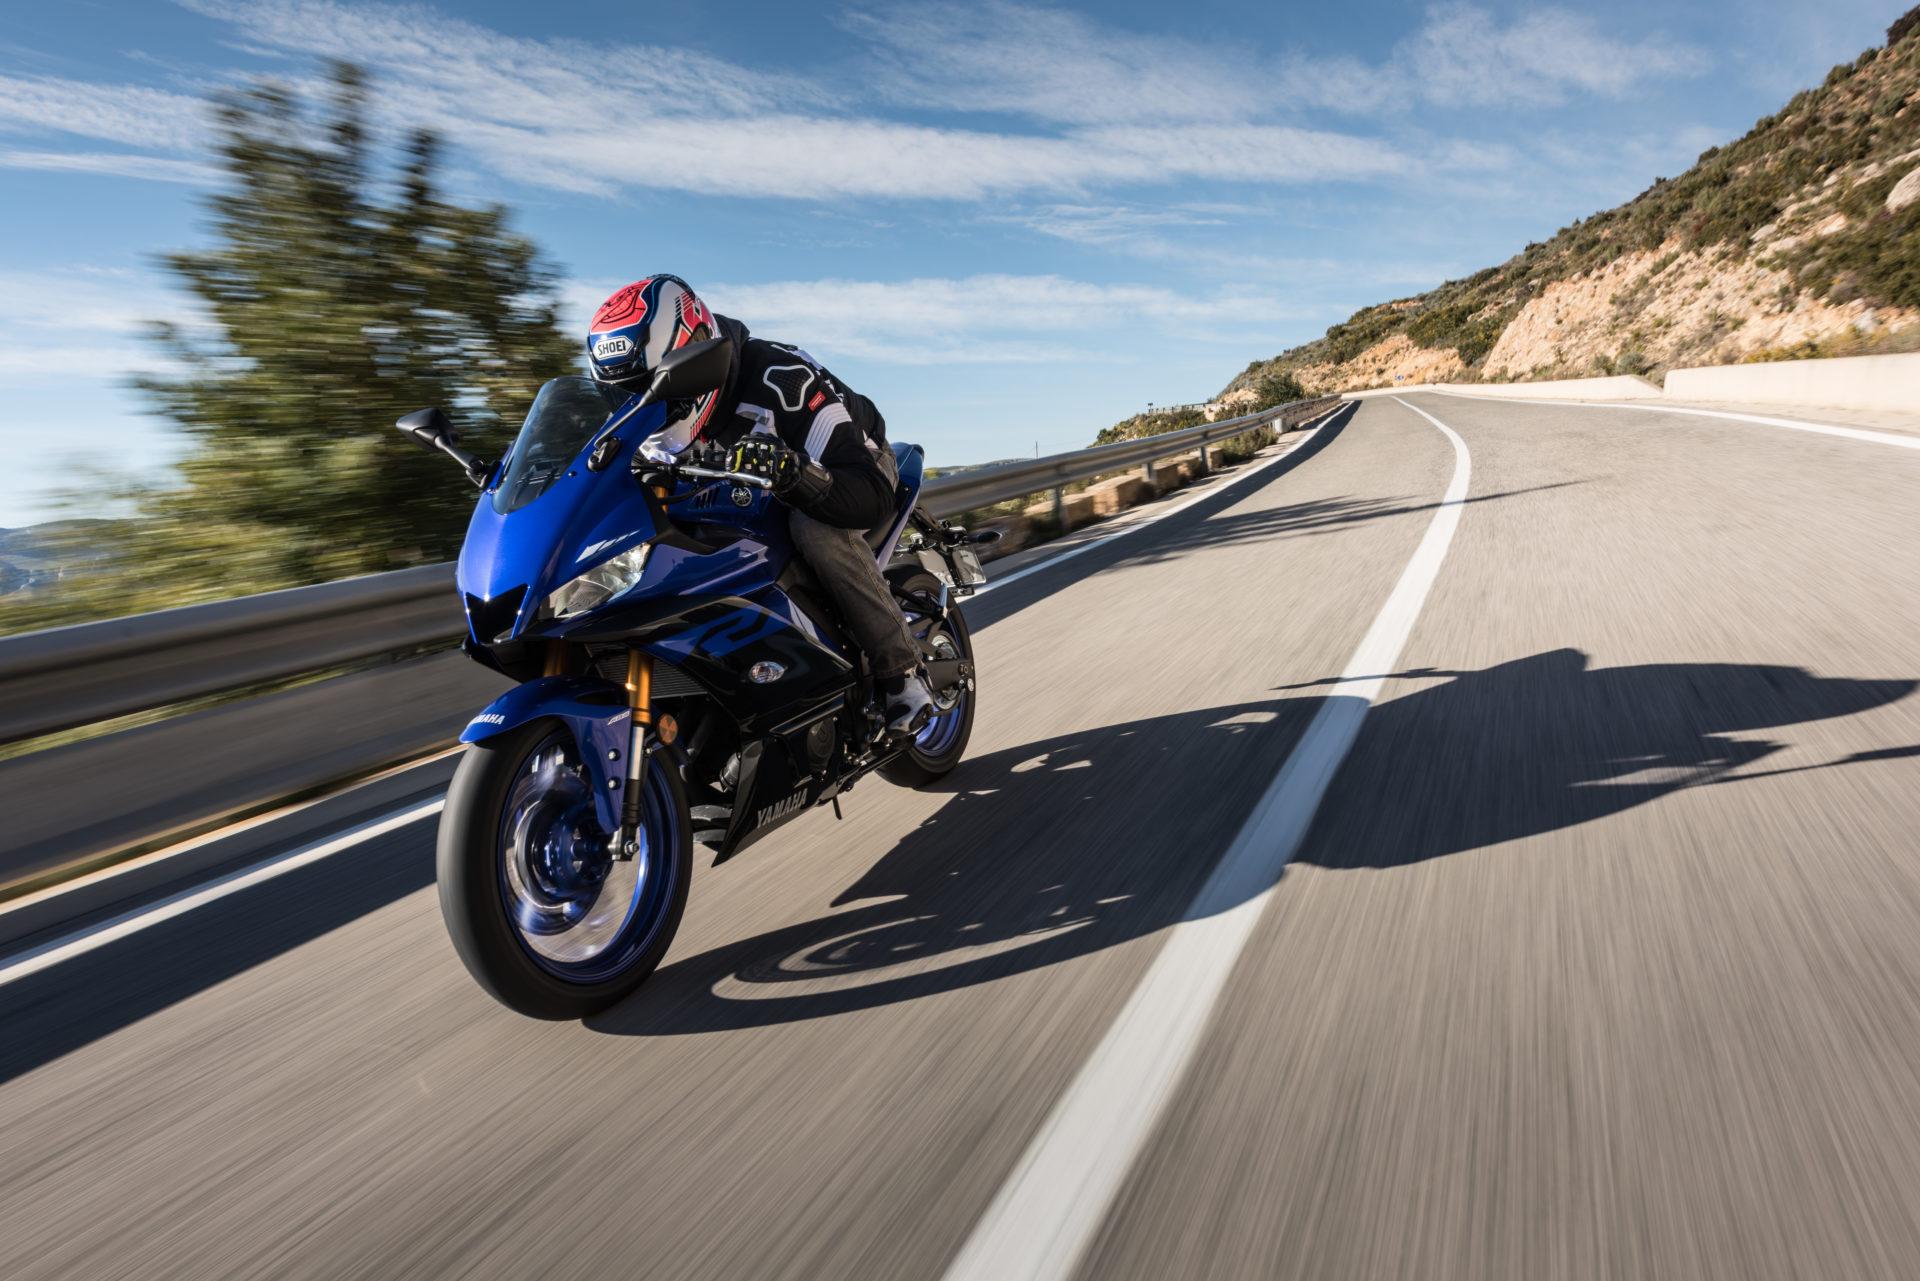 Yamaha R3 Motocykl dla niskich osób